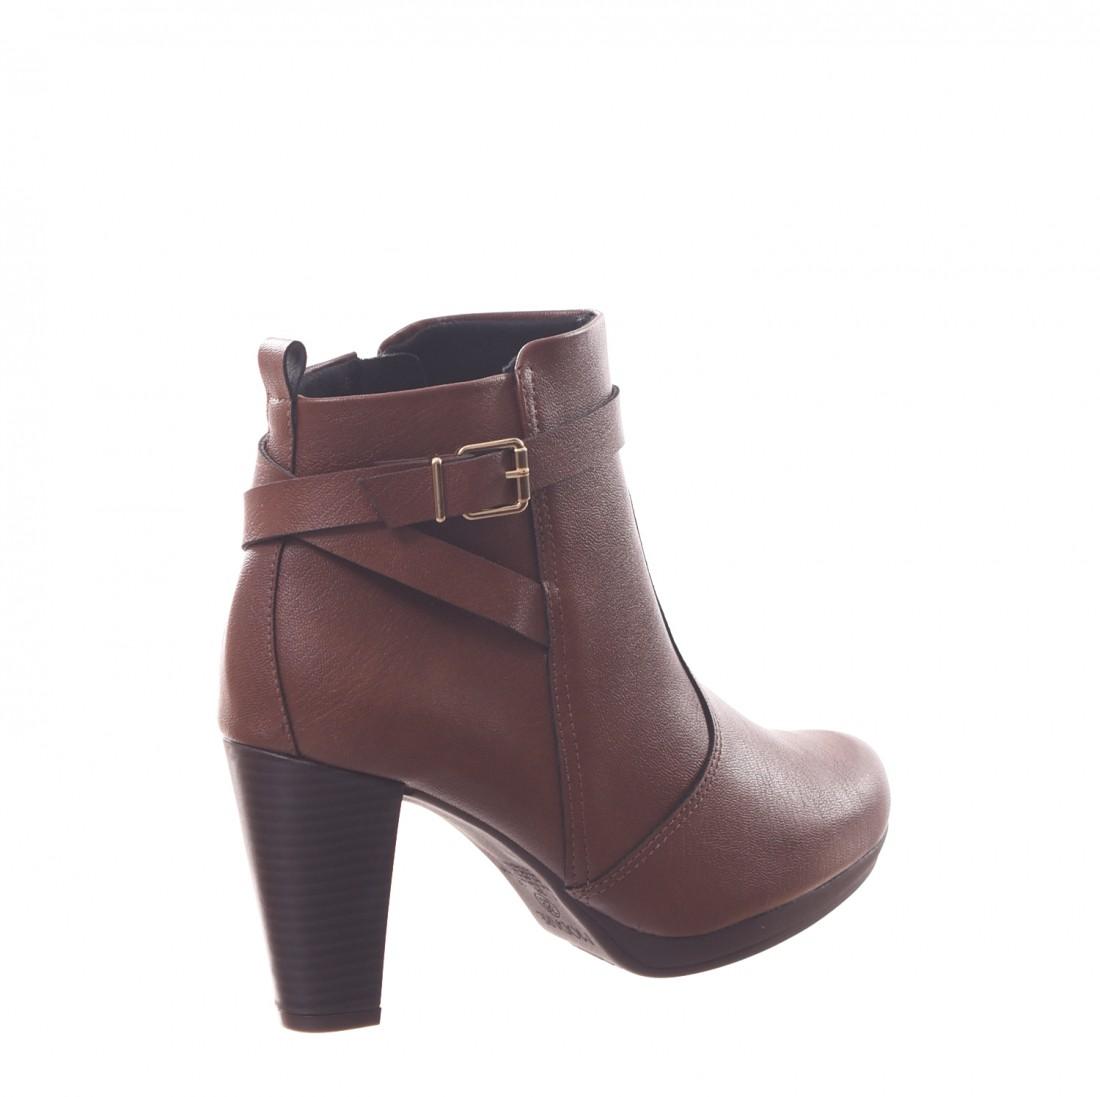 6689d66c46 ... Bota Ankle Boot Modare Ultra Conforto Salto Grosso Detalhe Fivela  Marrom ...